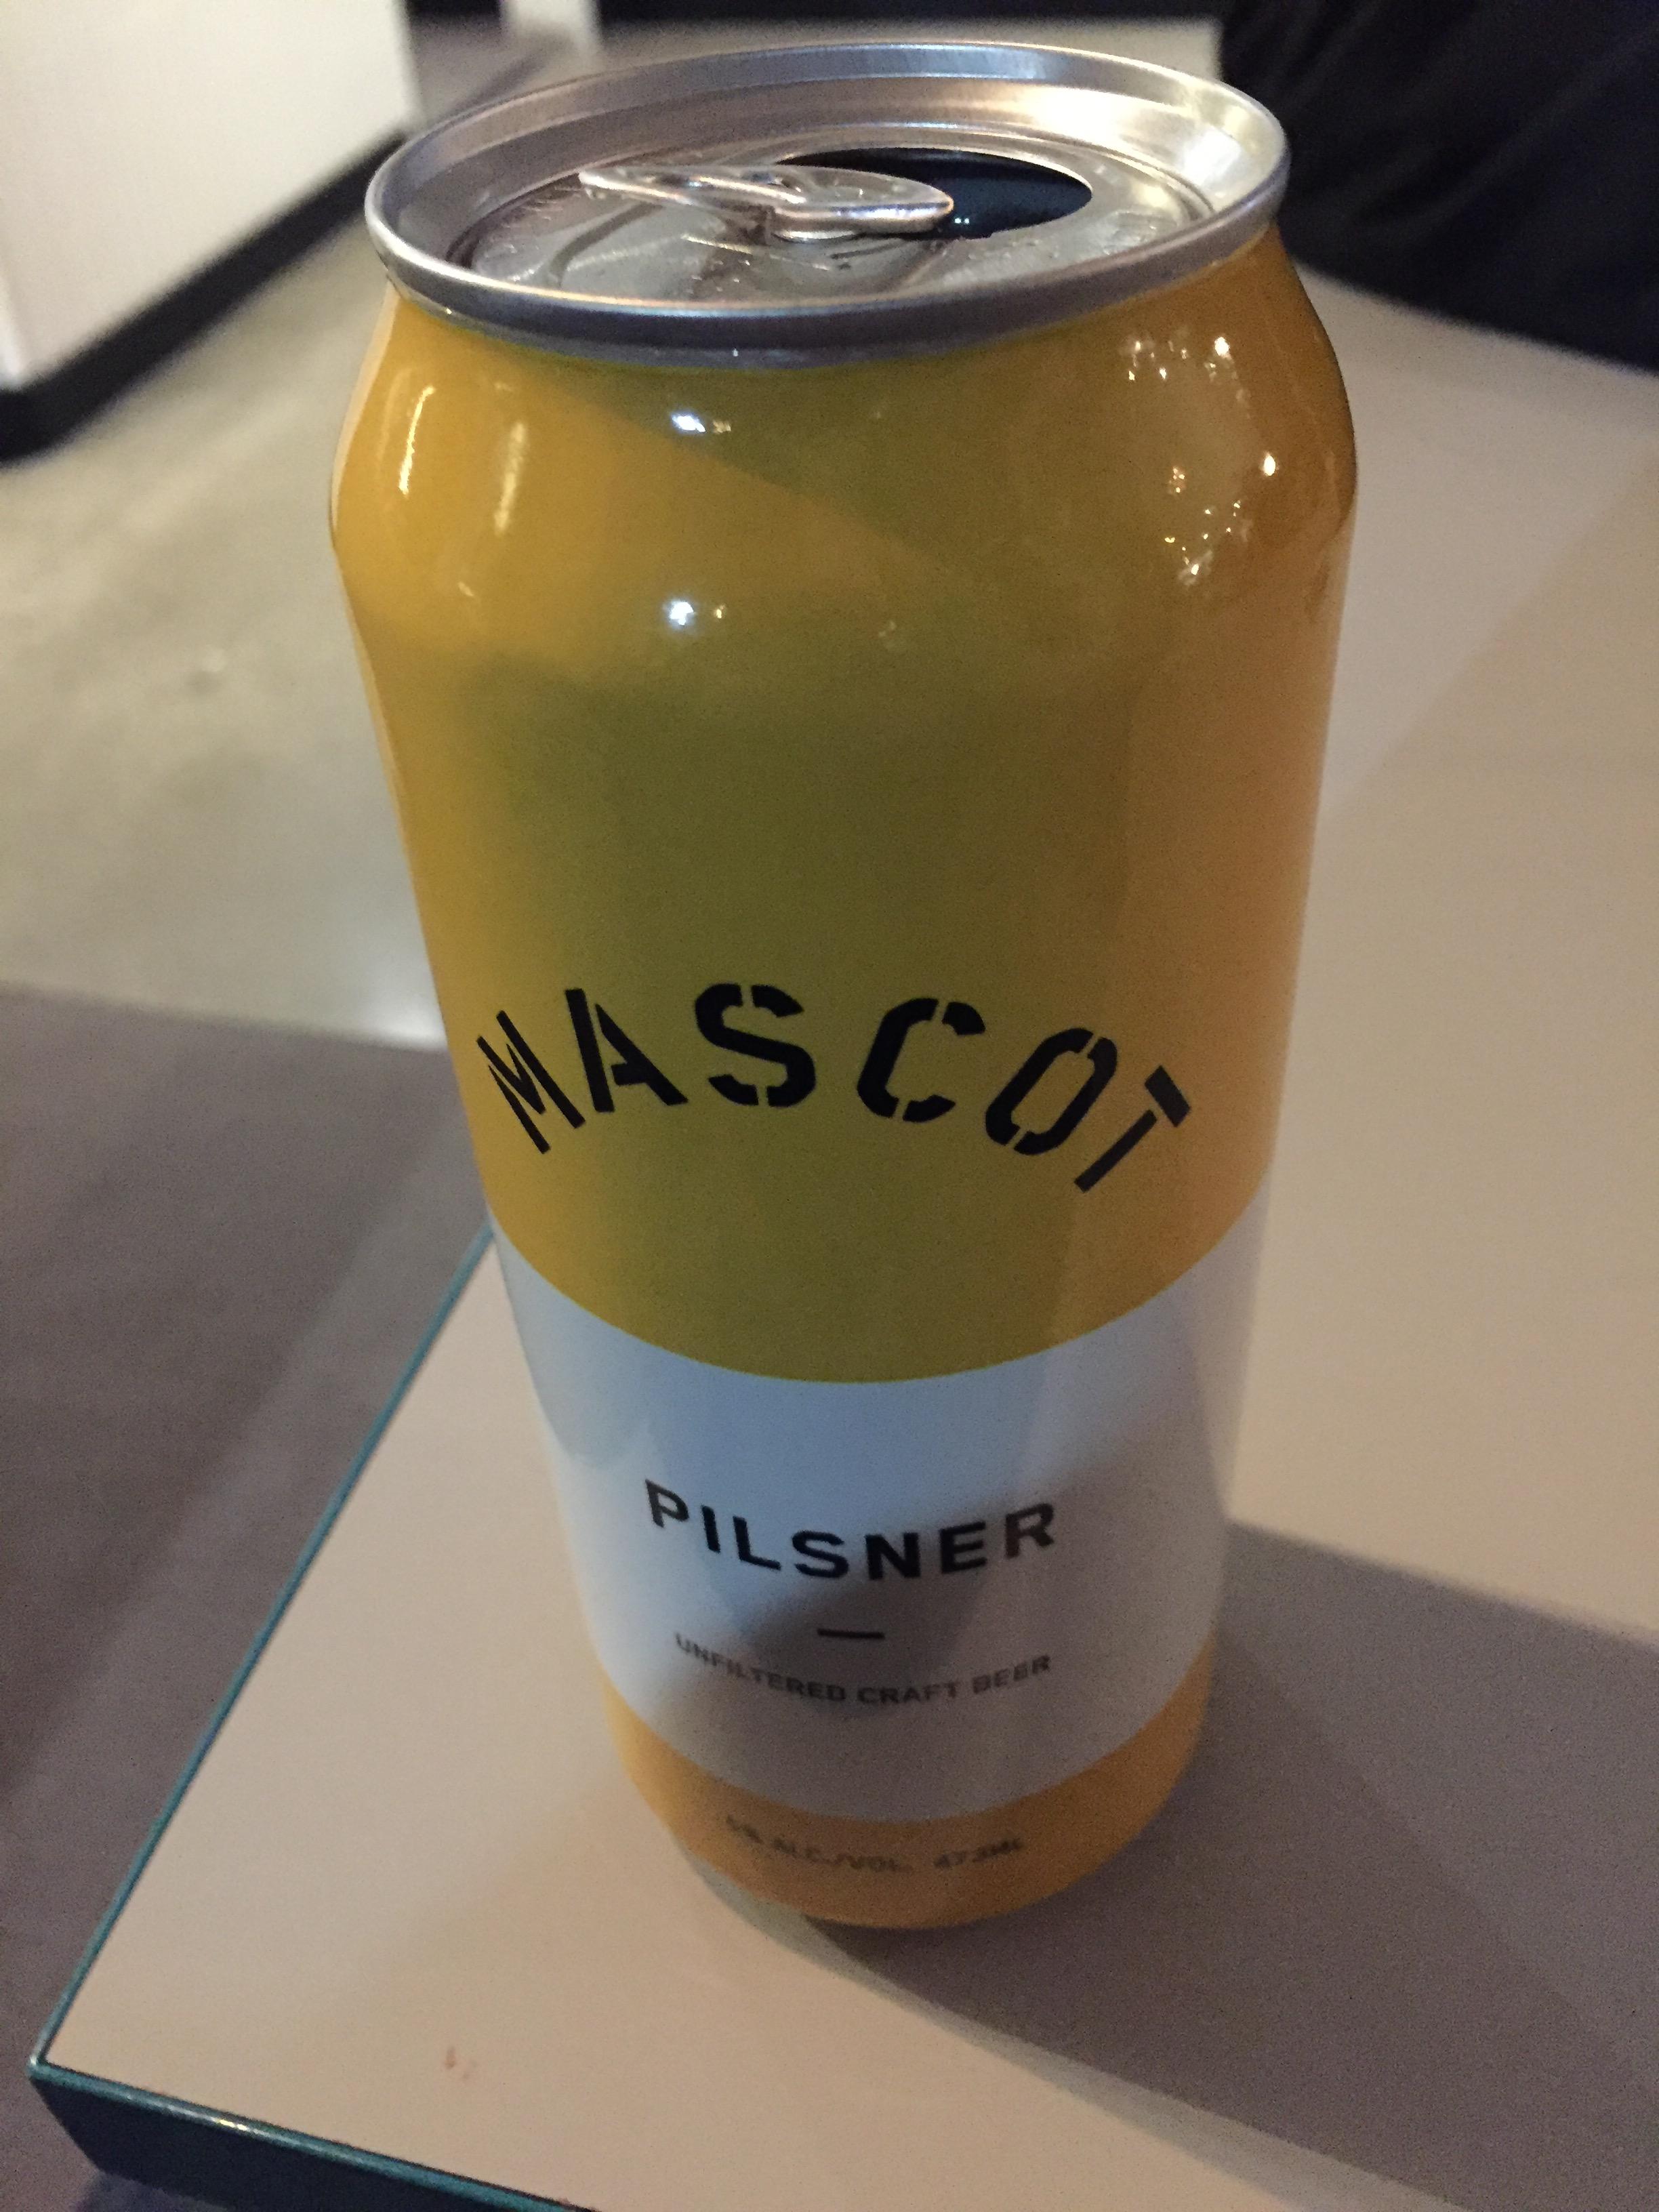 mascot_pilsner (1)